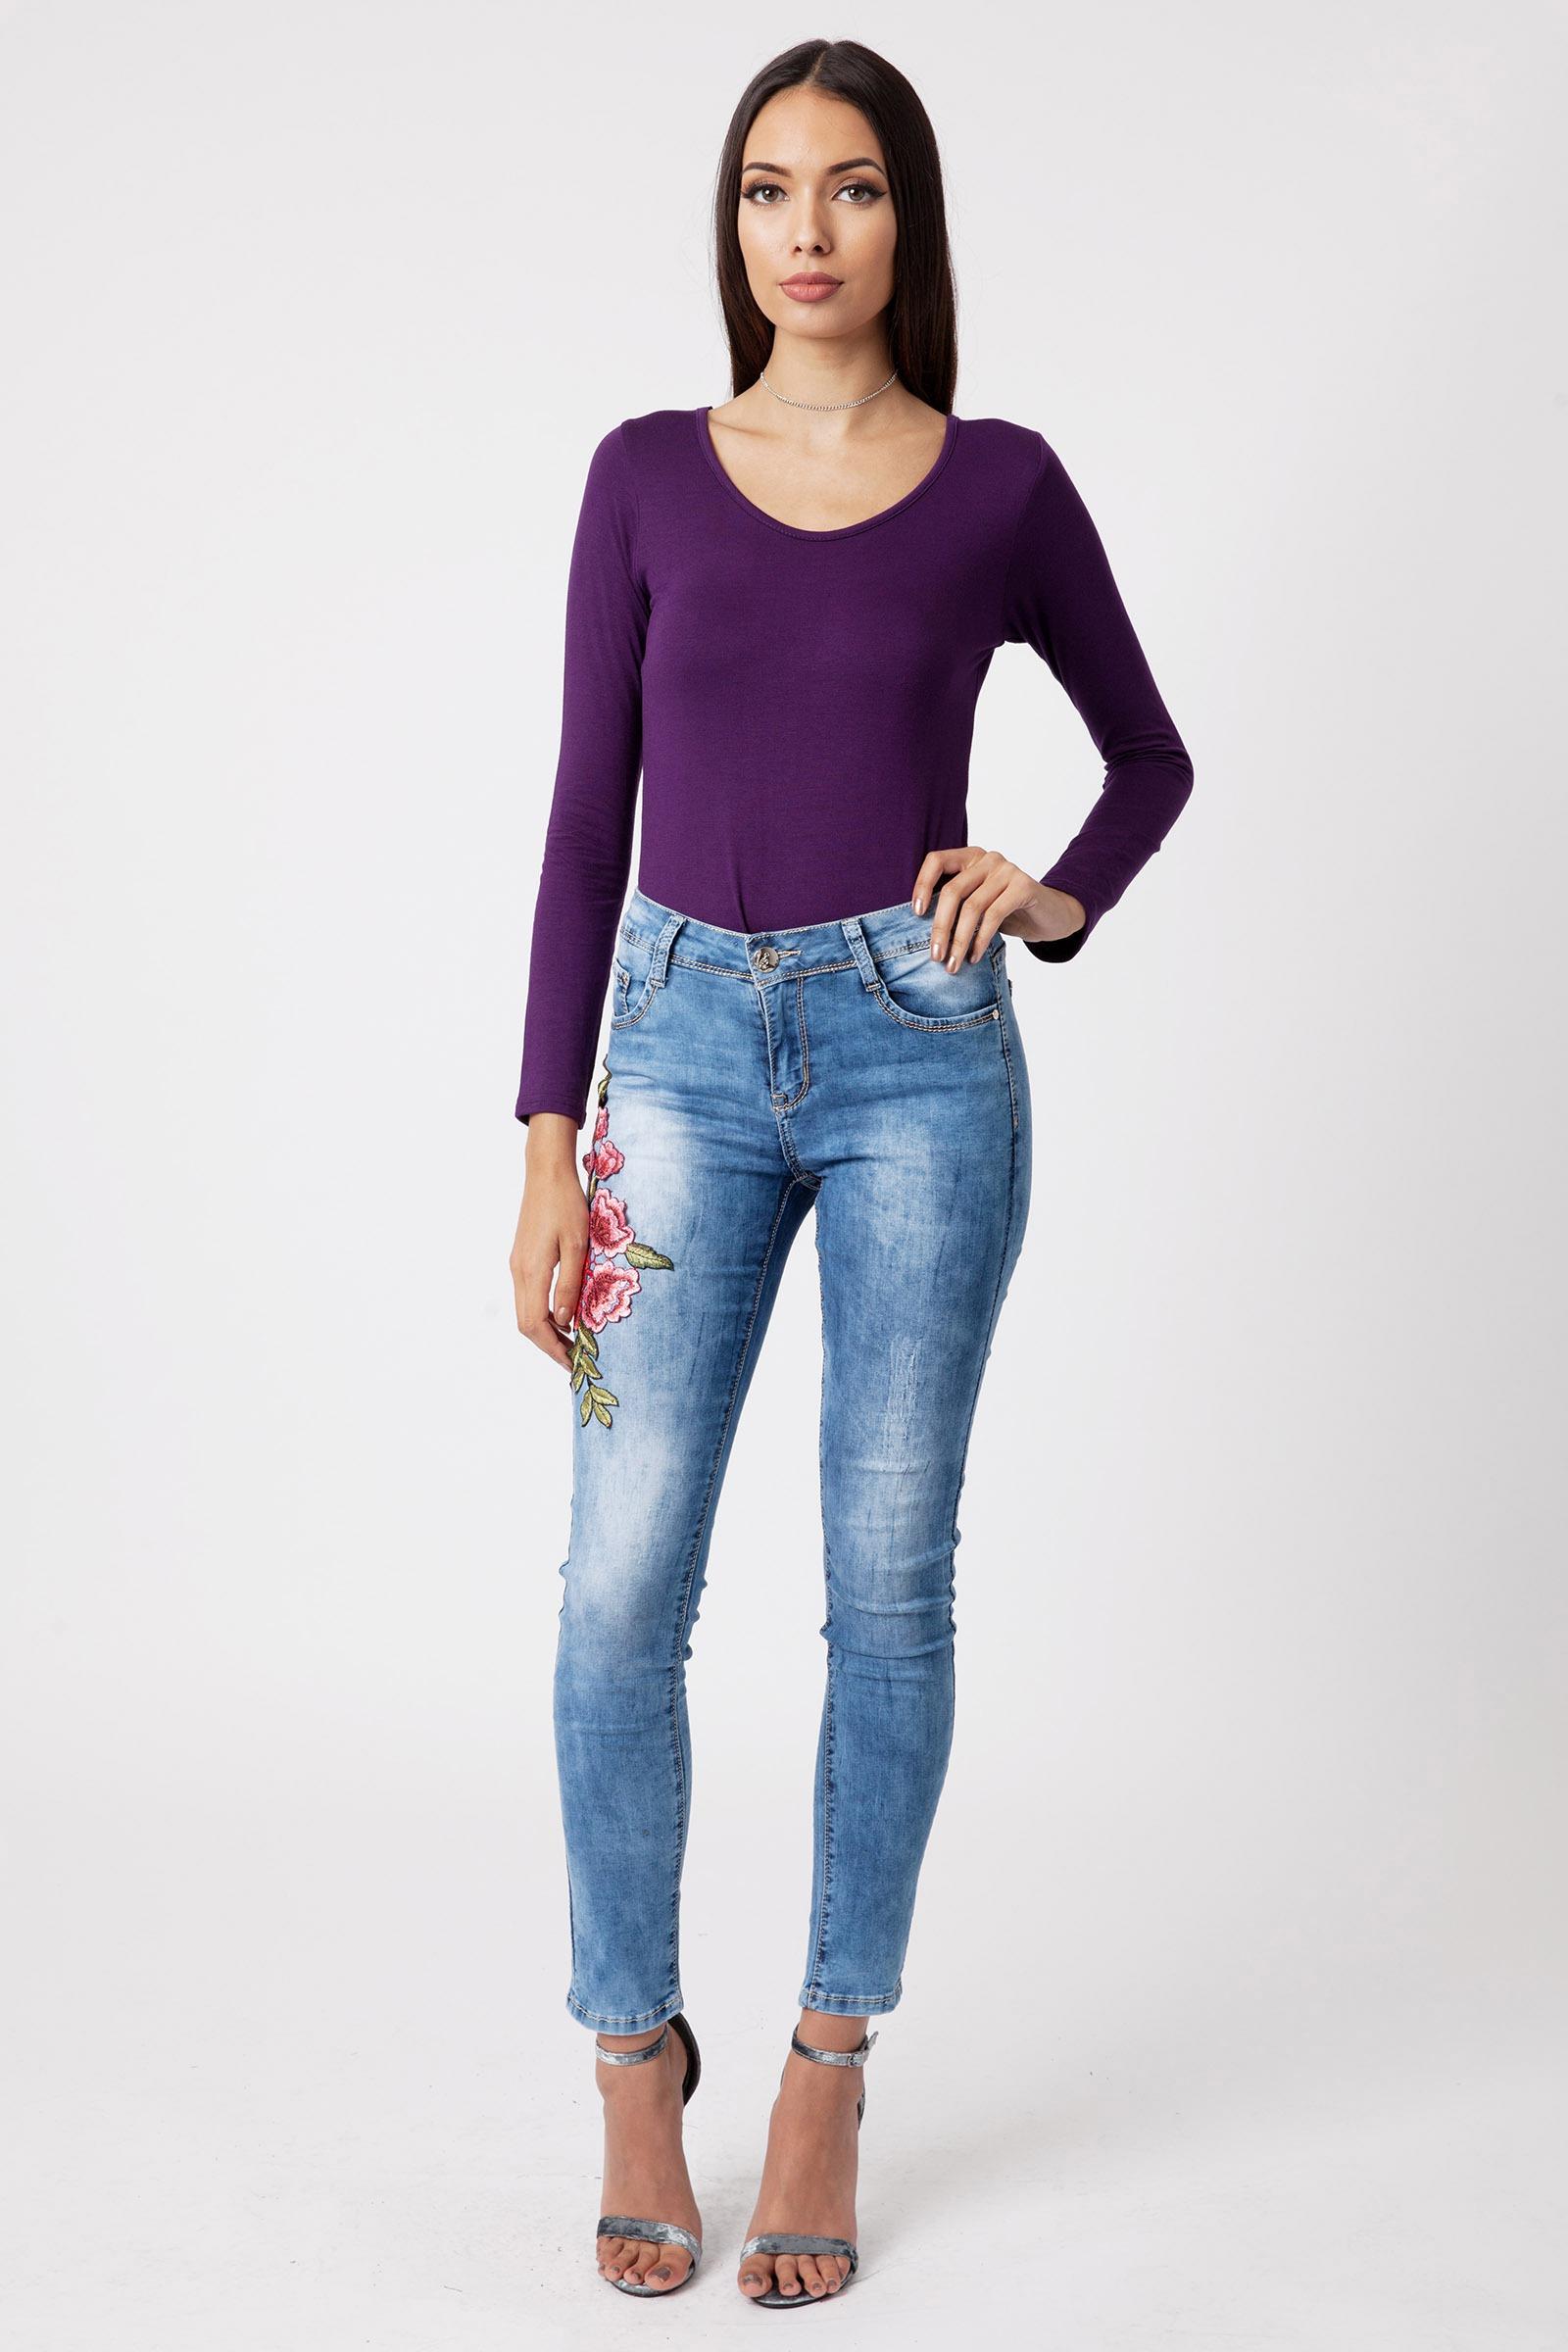 Purple Long Sleeve Scoop Neck Bodysuit |bodysuits Modamore